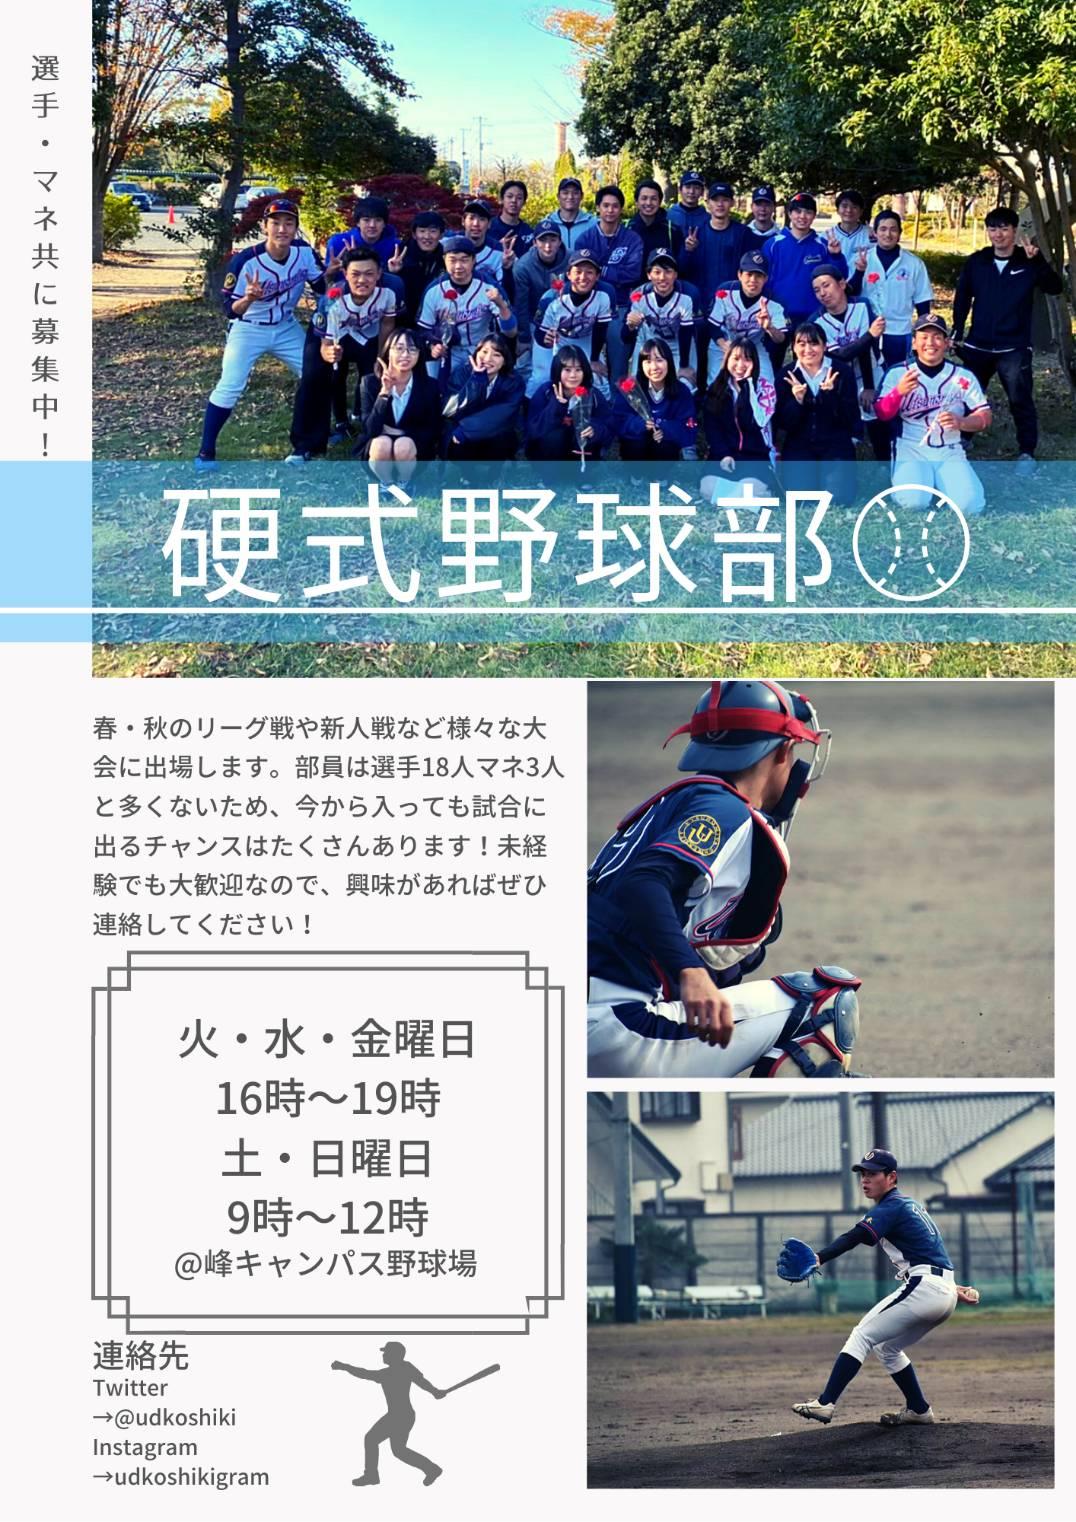 宇都宮大学硬式野球部のビラ